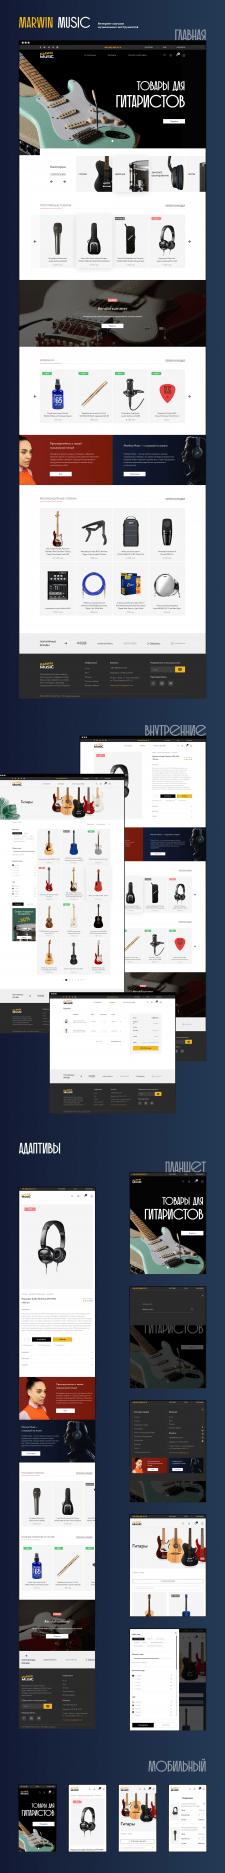 Интернет магазин | Marwin Music